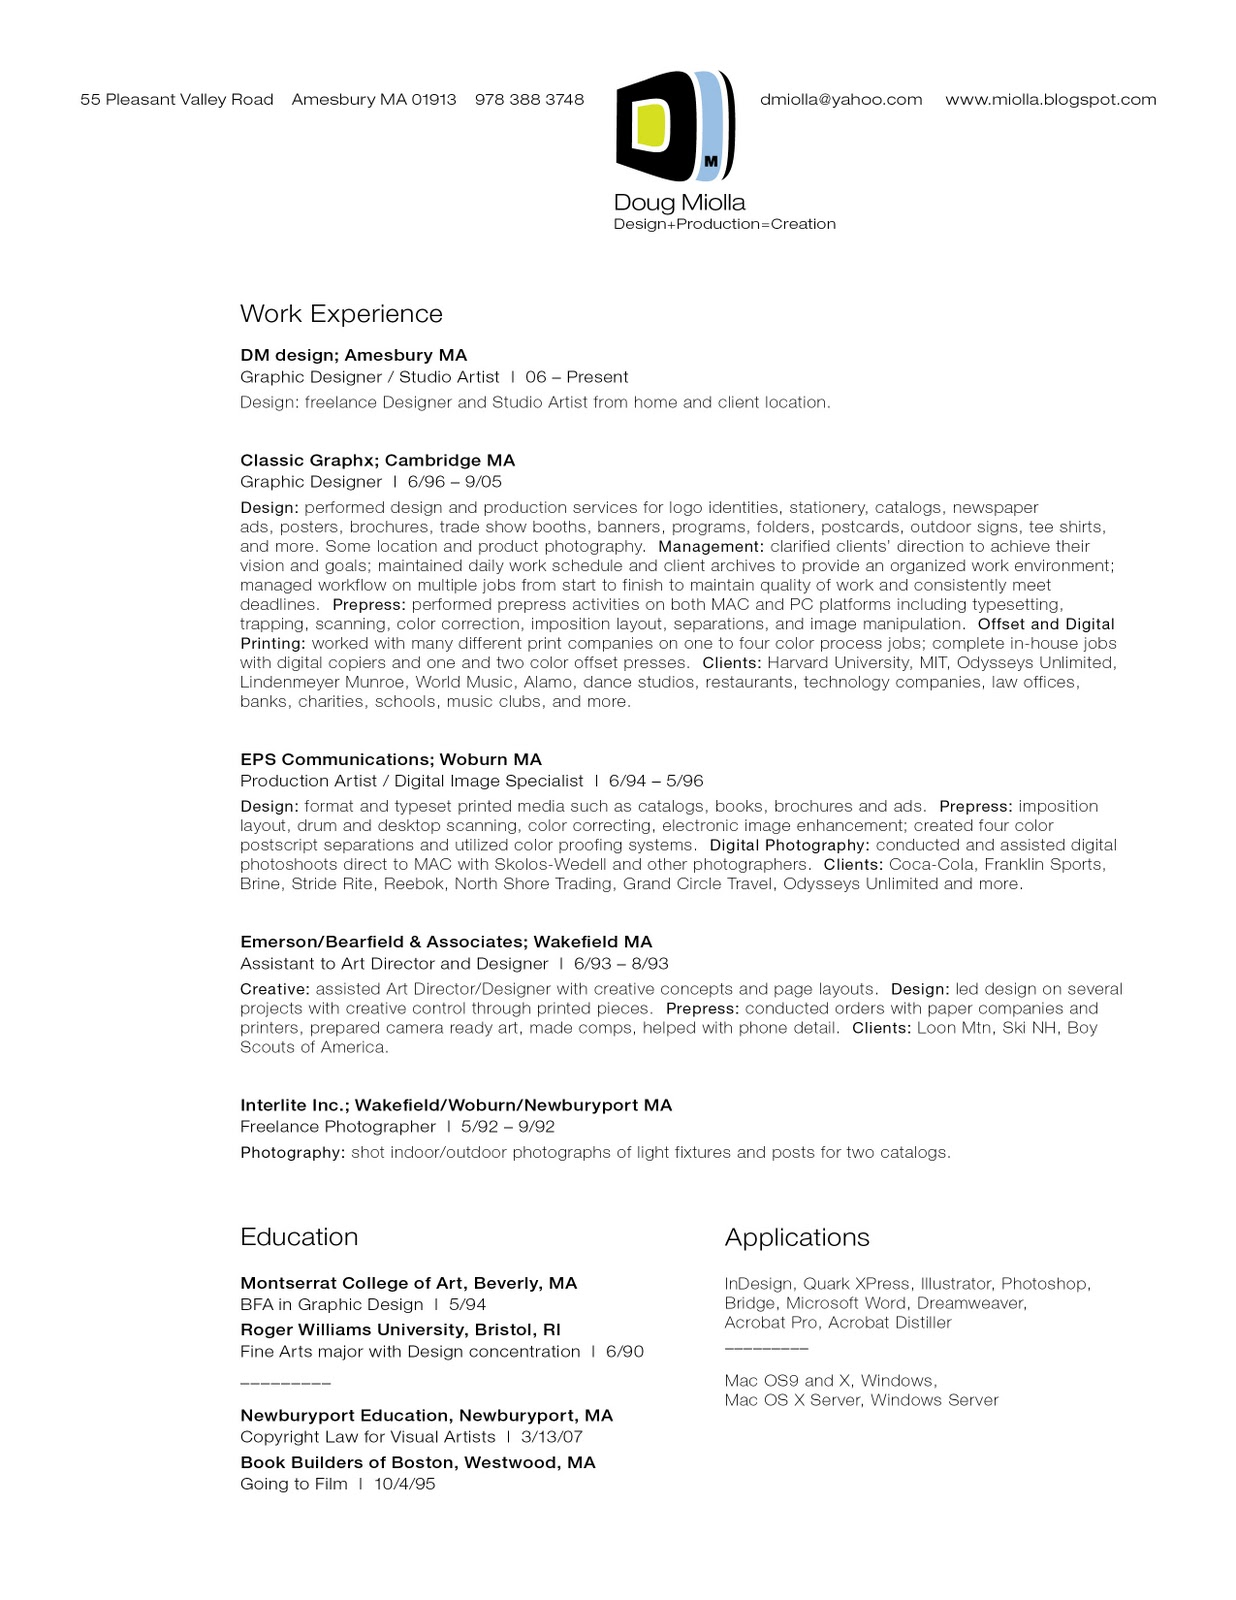 doug miolla portfolio resume resume click to enlarge